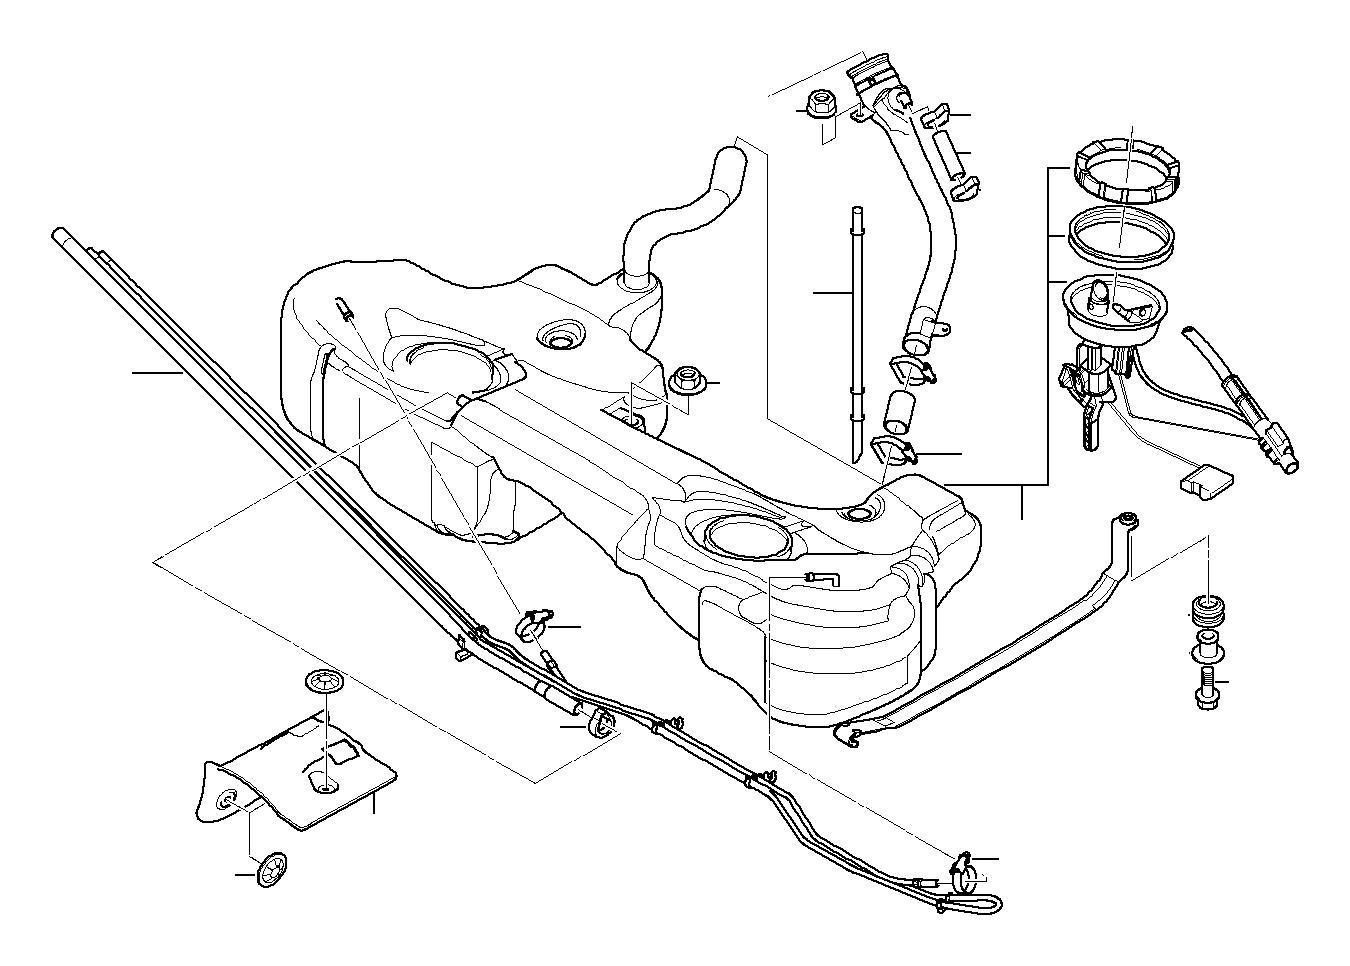 Bmw 330xi Plastic Fuel Tank With Left Sensor System